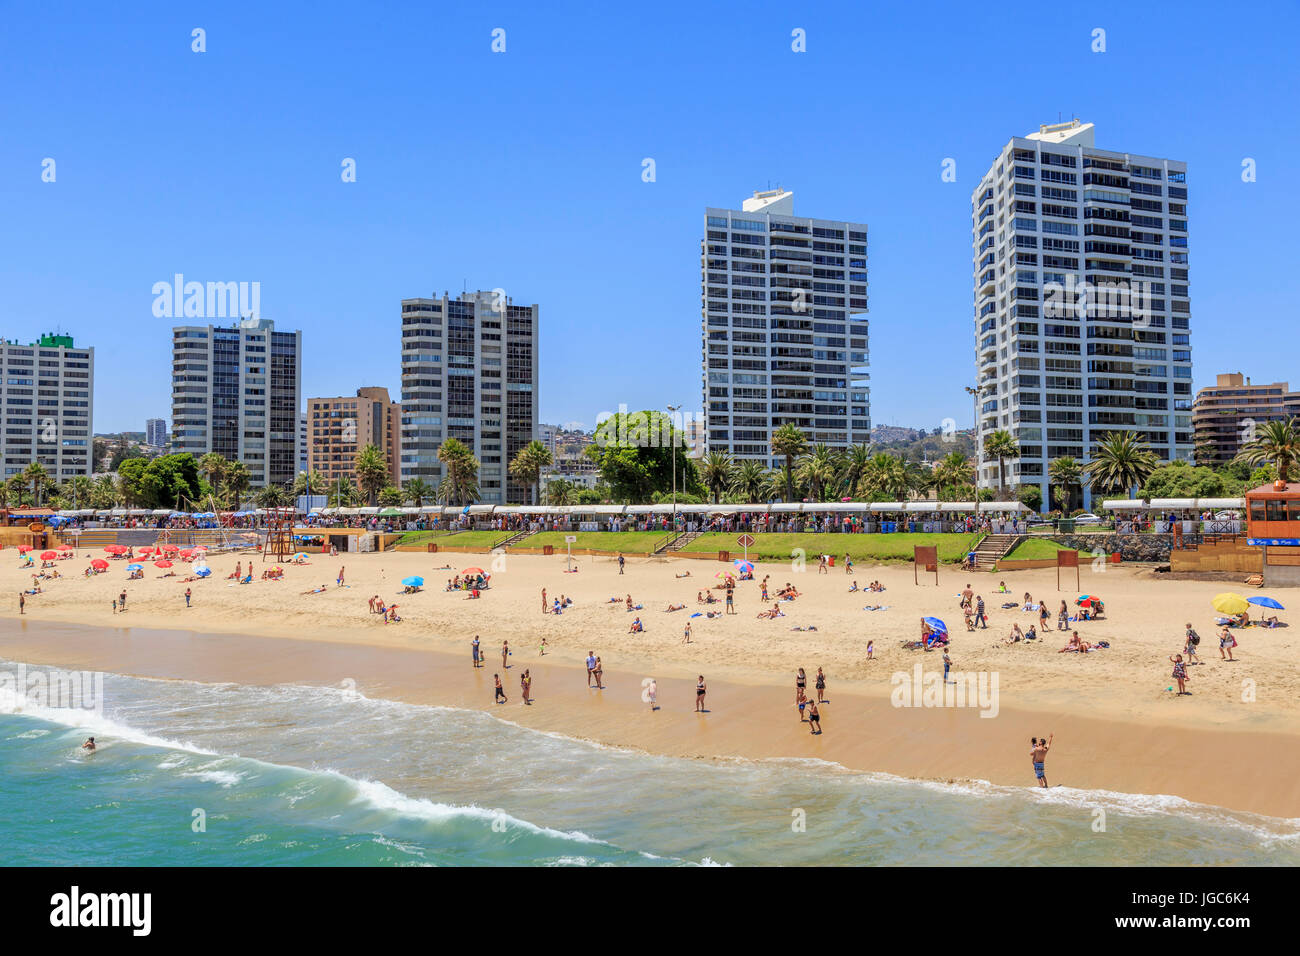 Beach, Viña del Mar, Chile, South America - Stock Image